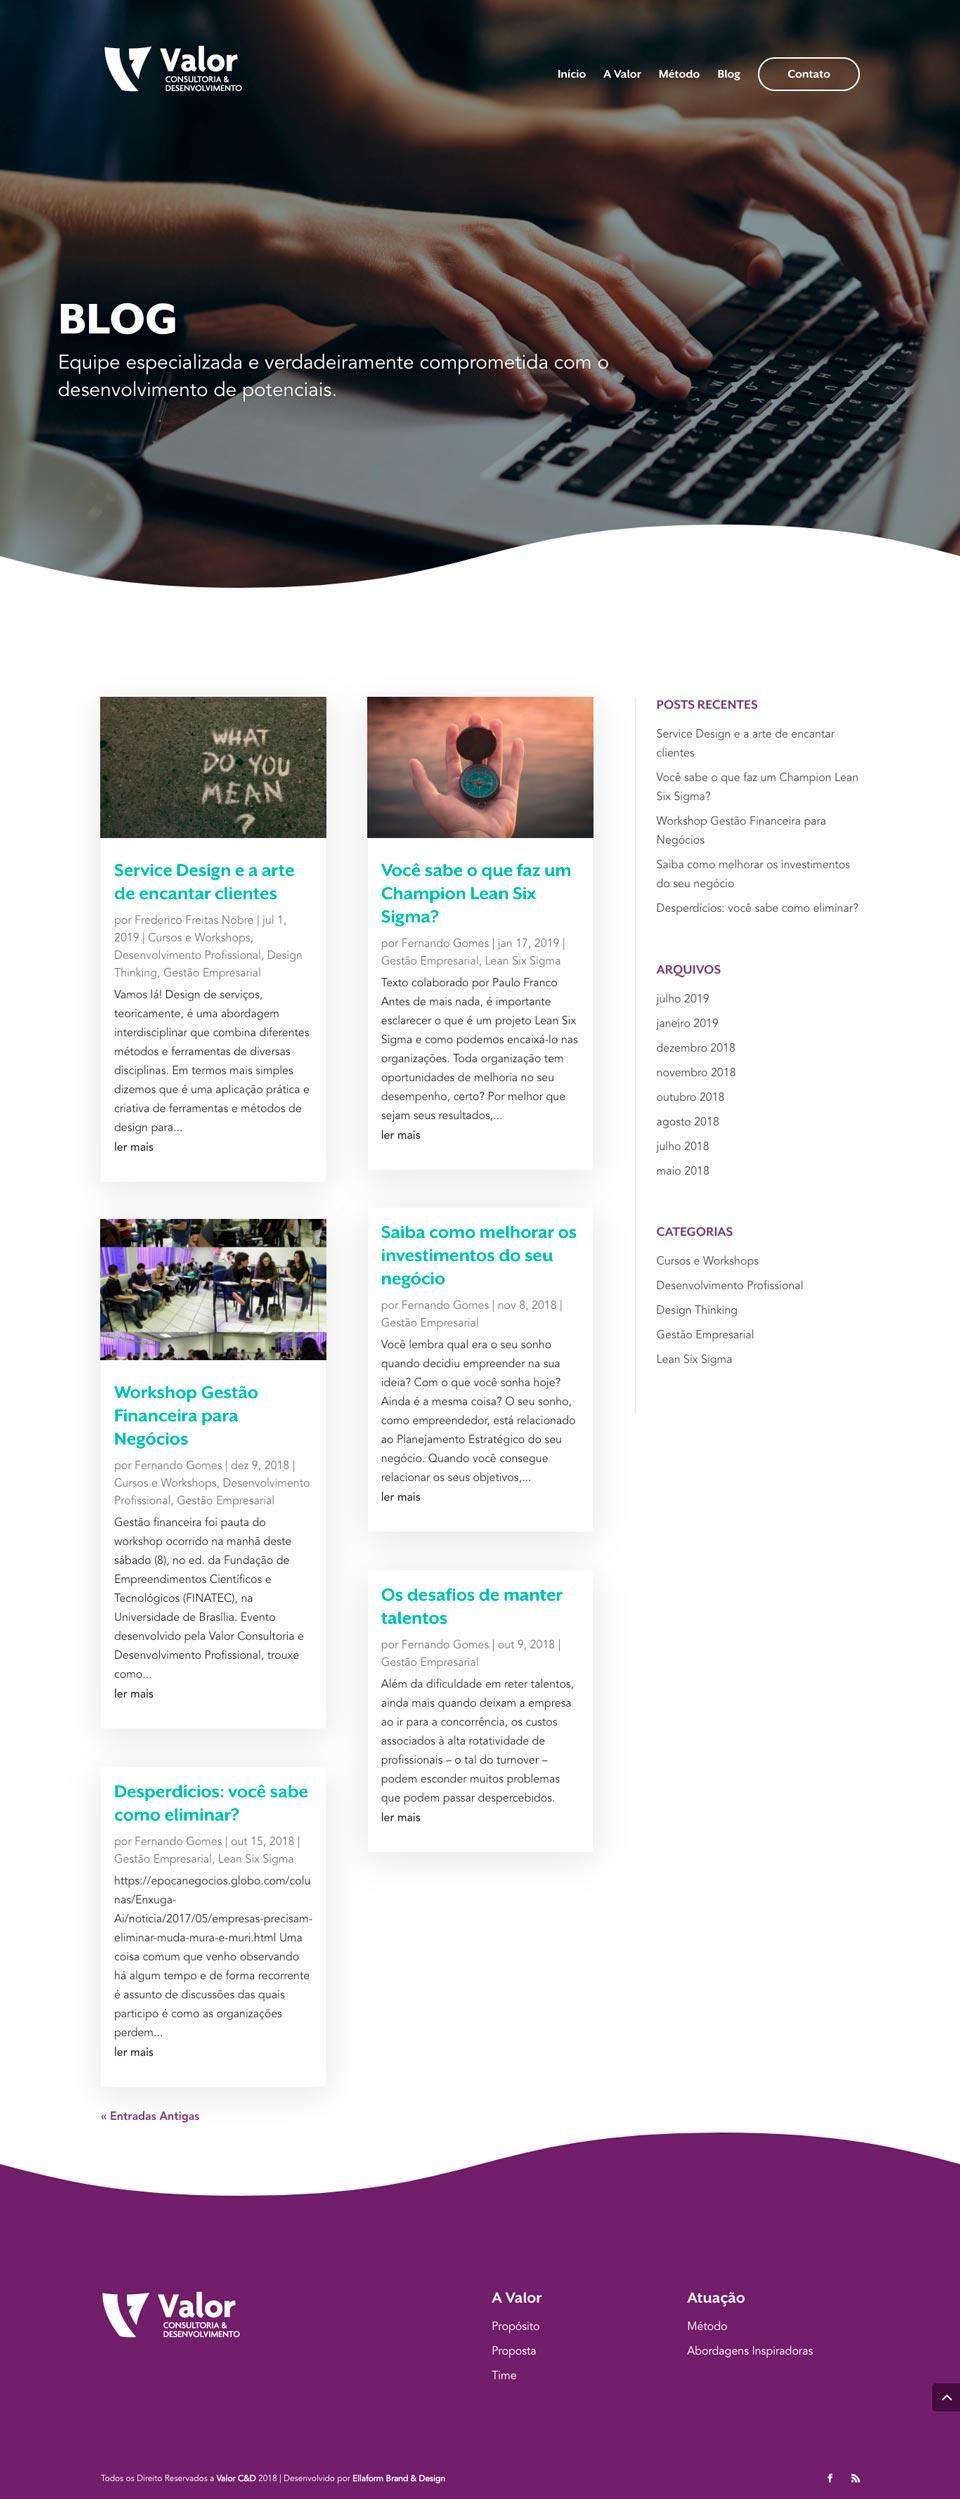 pagina-blog-valor